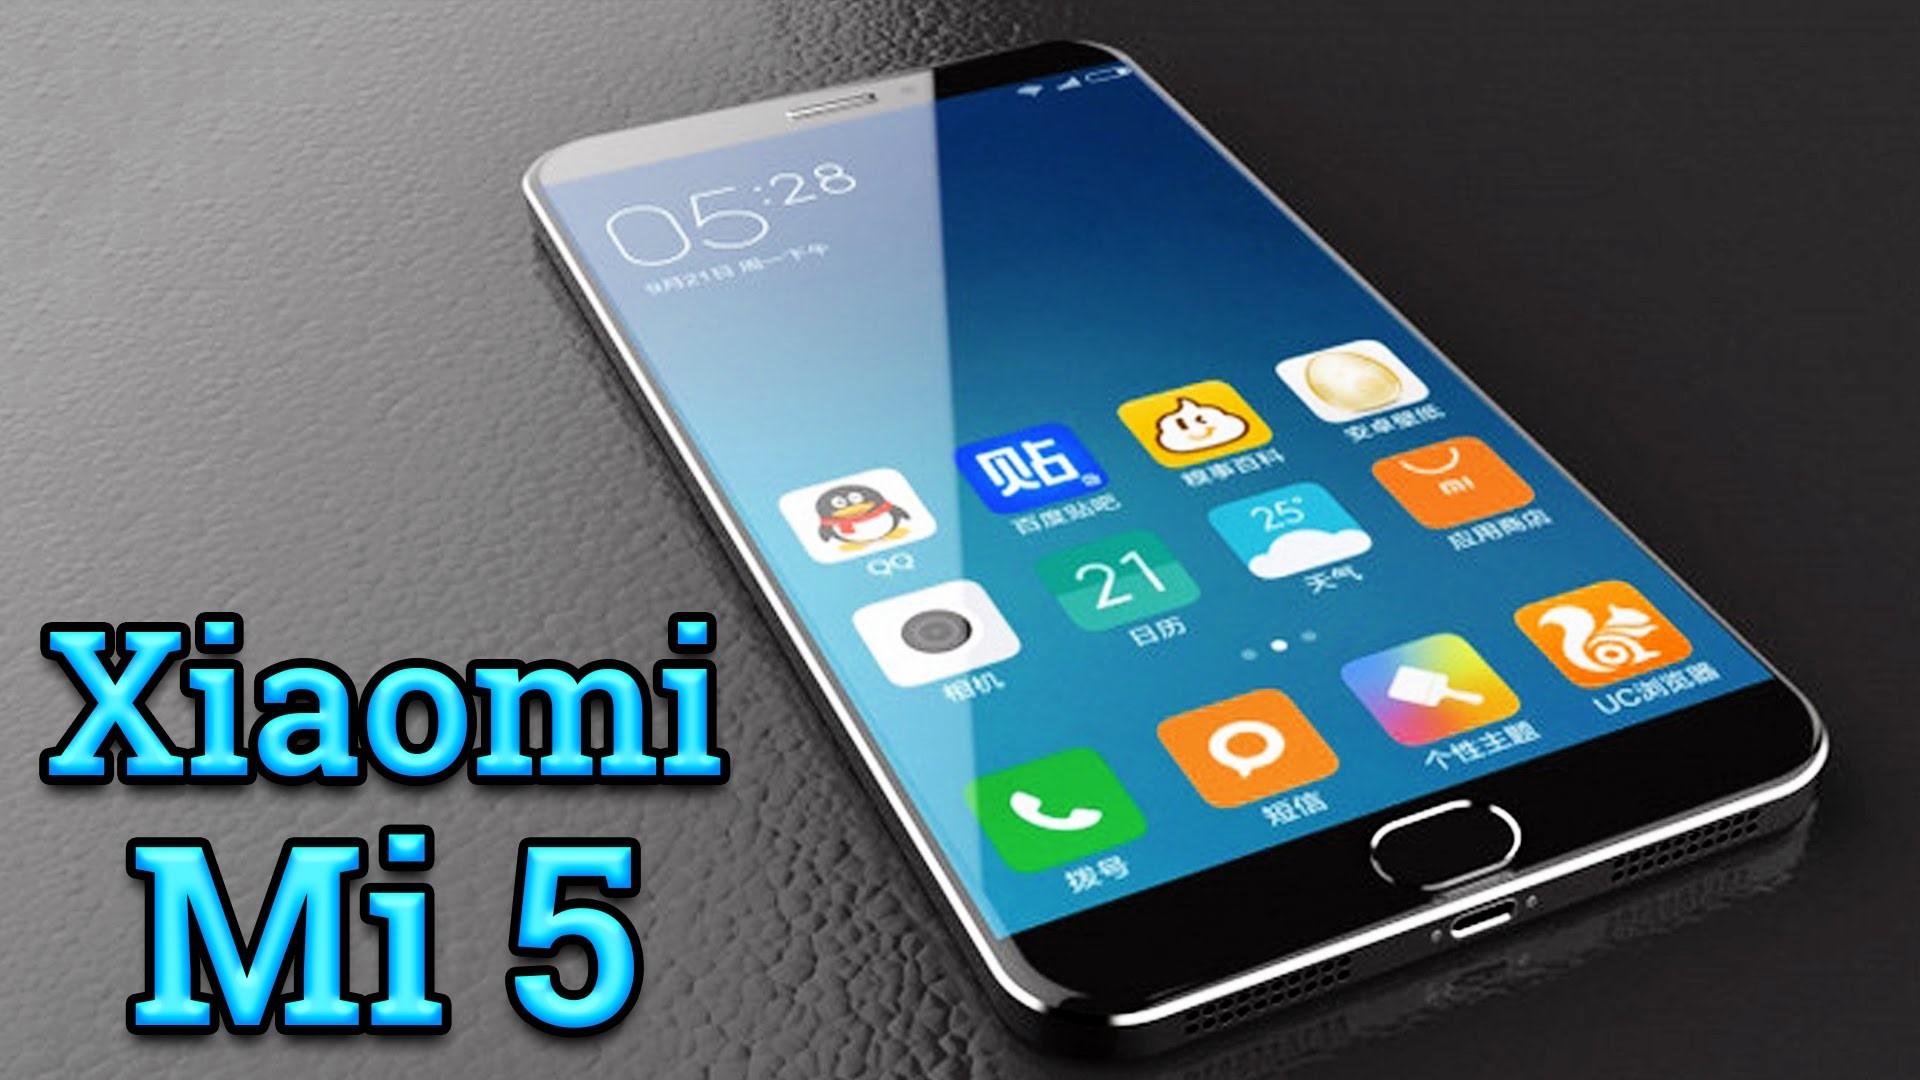 Внешний вид Xiaomi Mi5 Plus